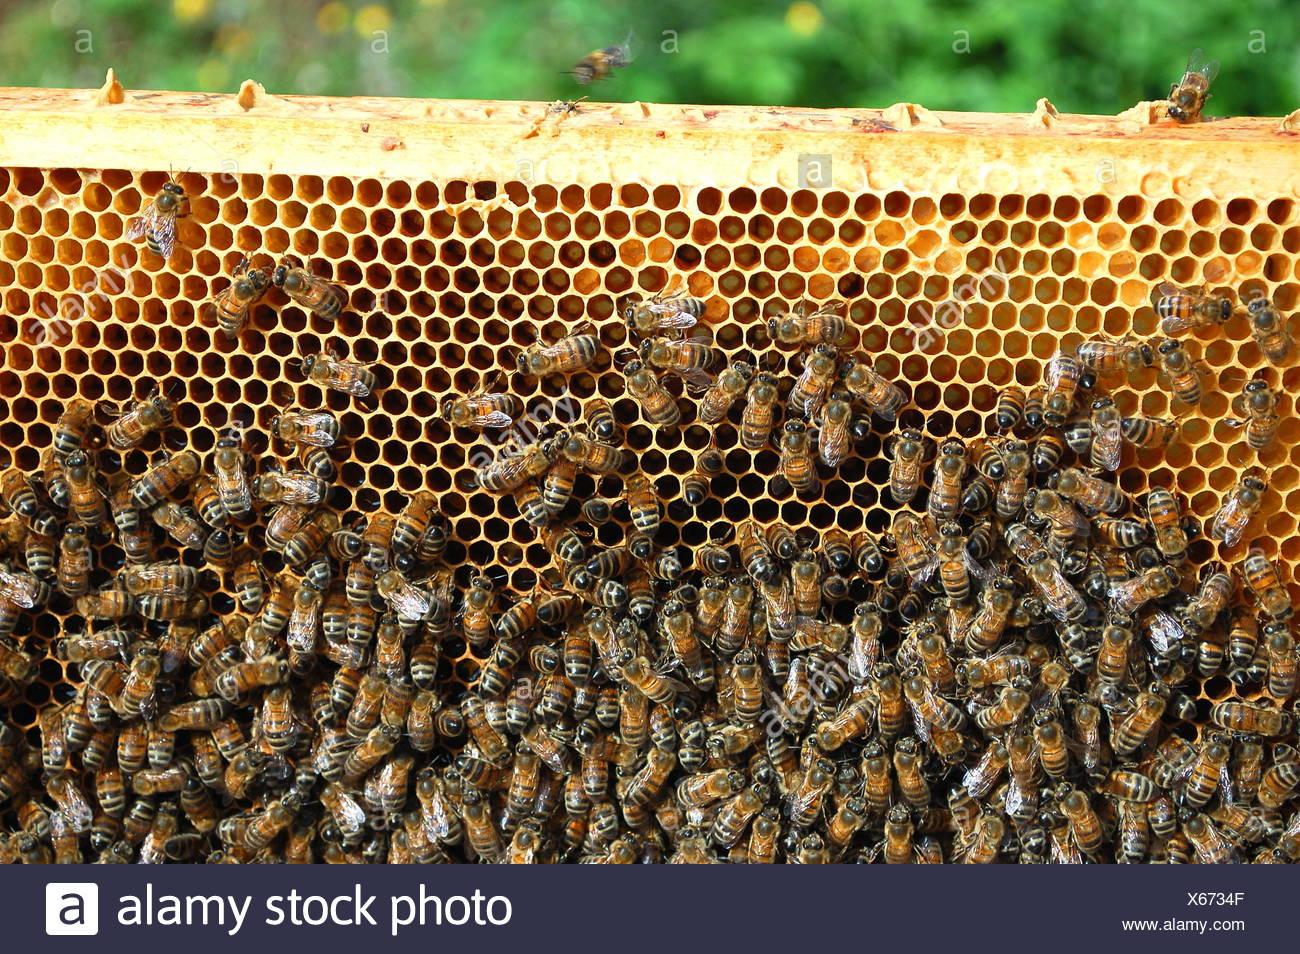 animal, insect, wild, bees, apiary, wallpaper, honeycomb, nature, macro, - Stock Image